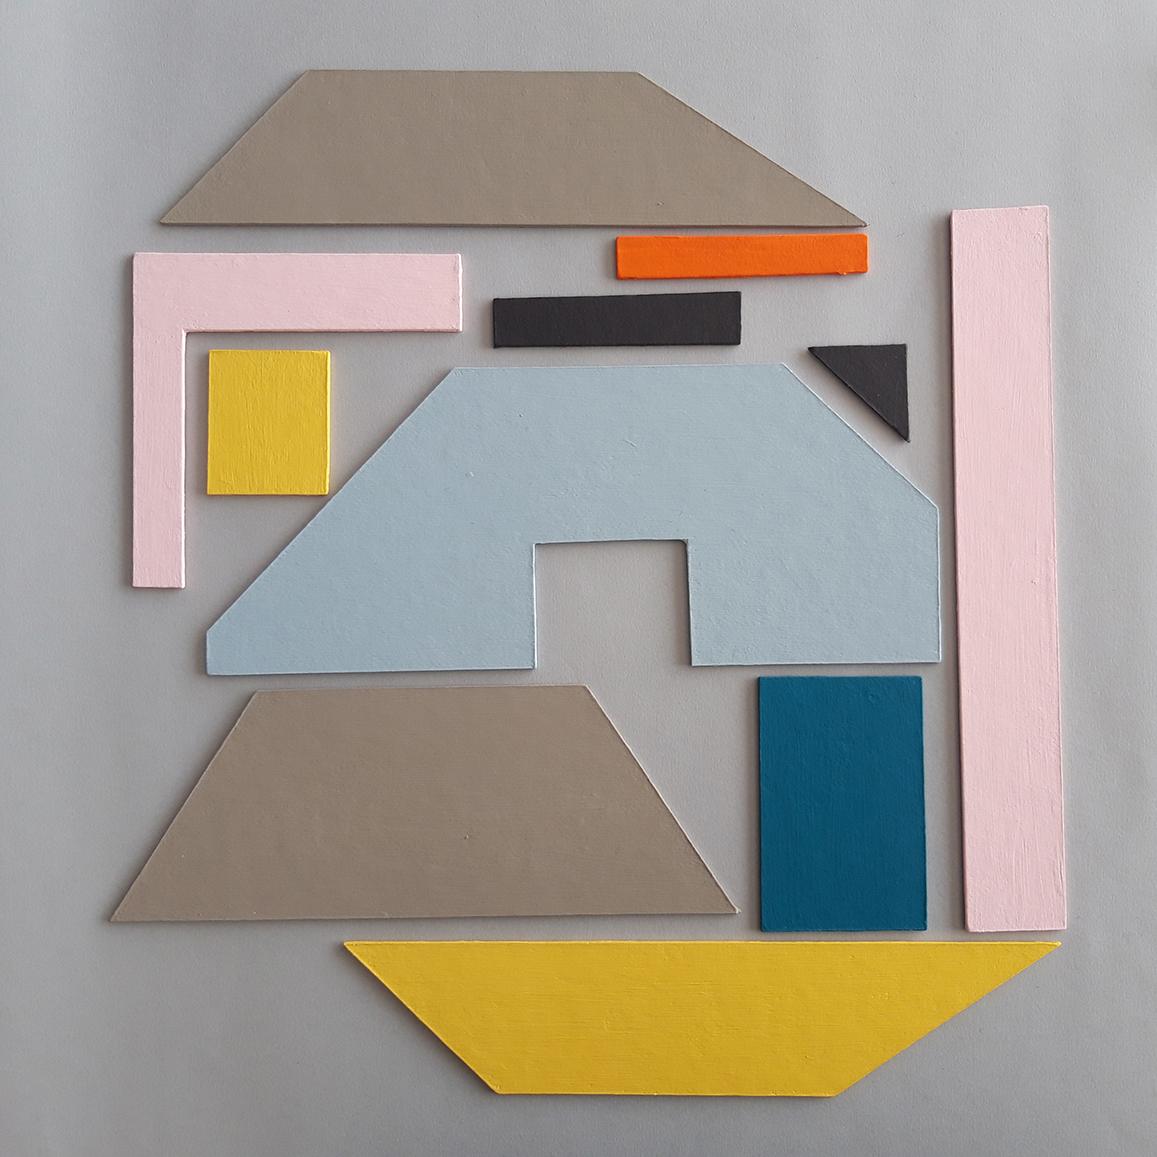 Eleanor_Pritchard_Fallingwater_shapes_1a.jpg